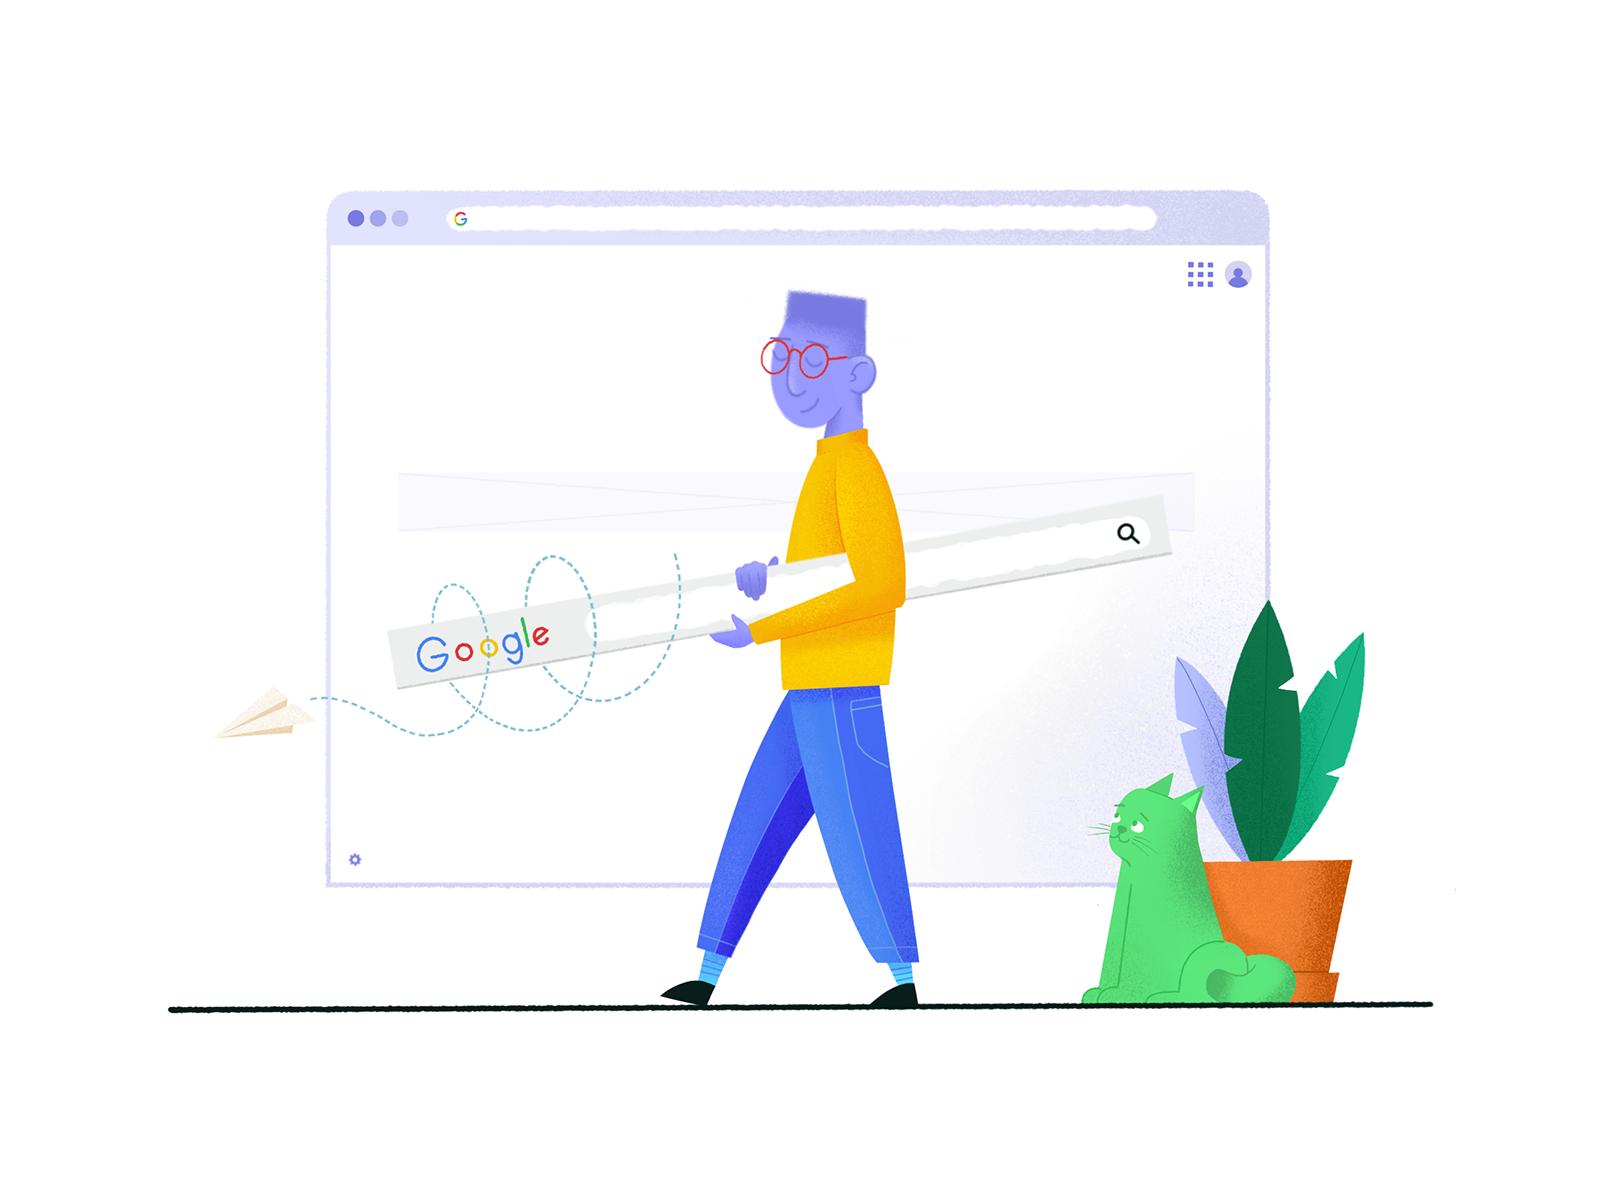 Google 1 1600x1200 4x